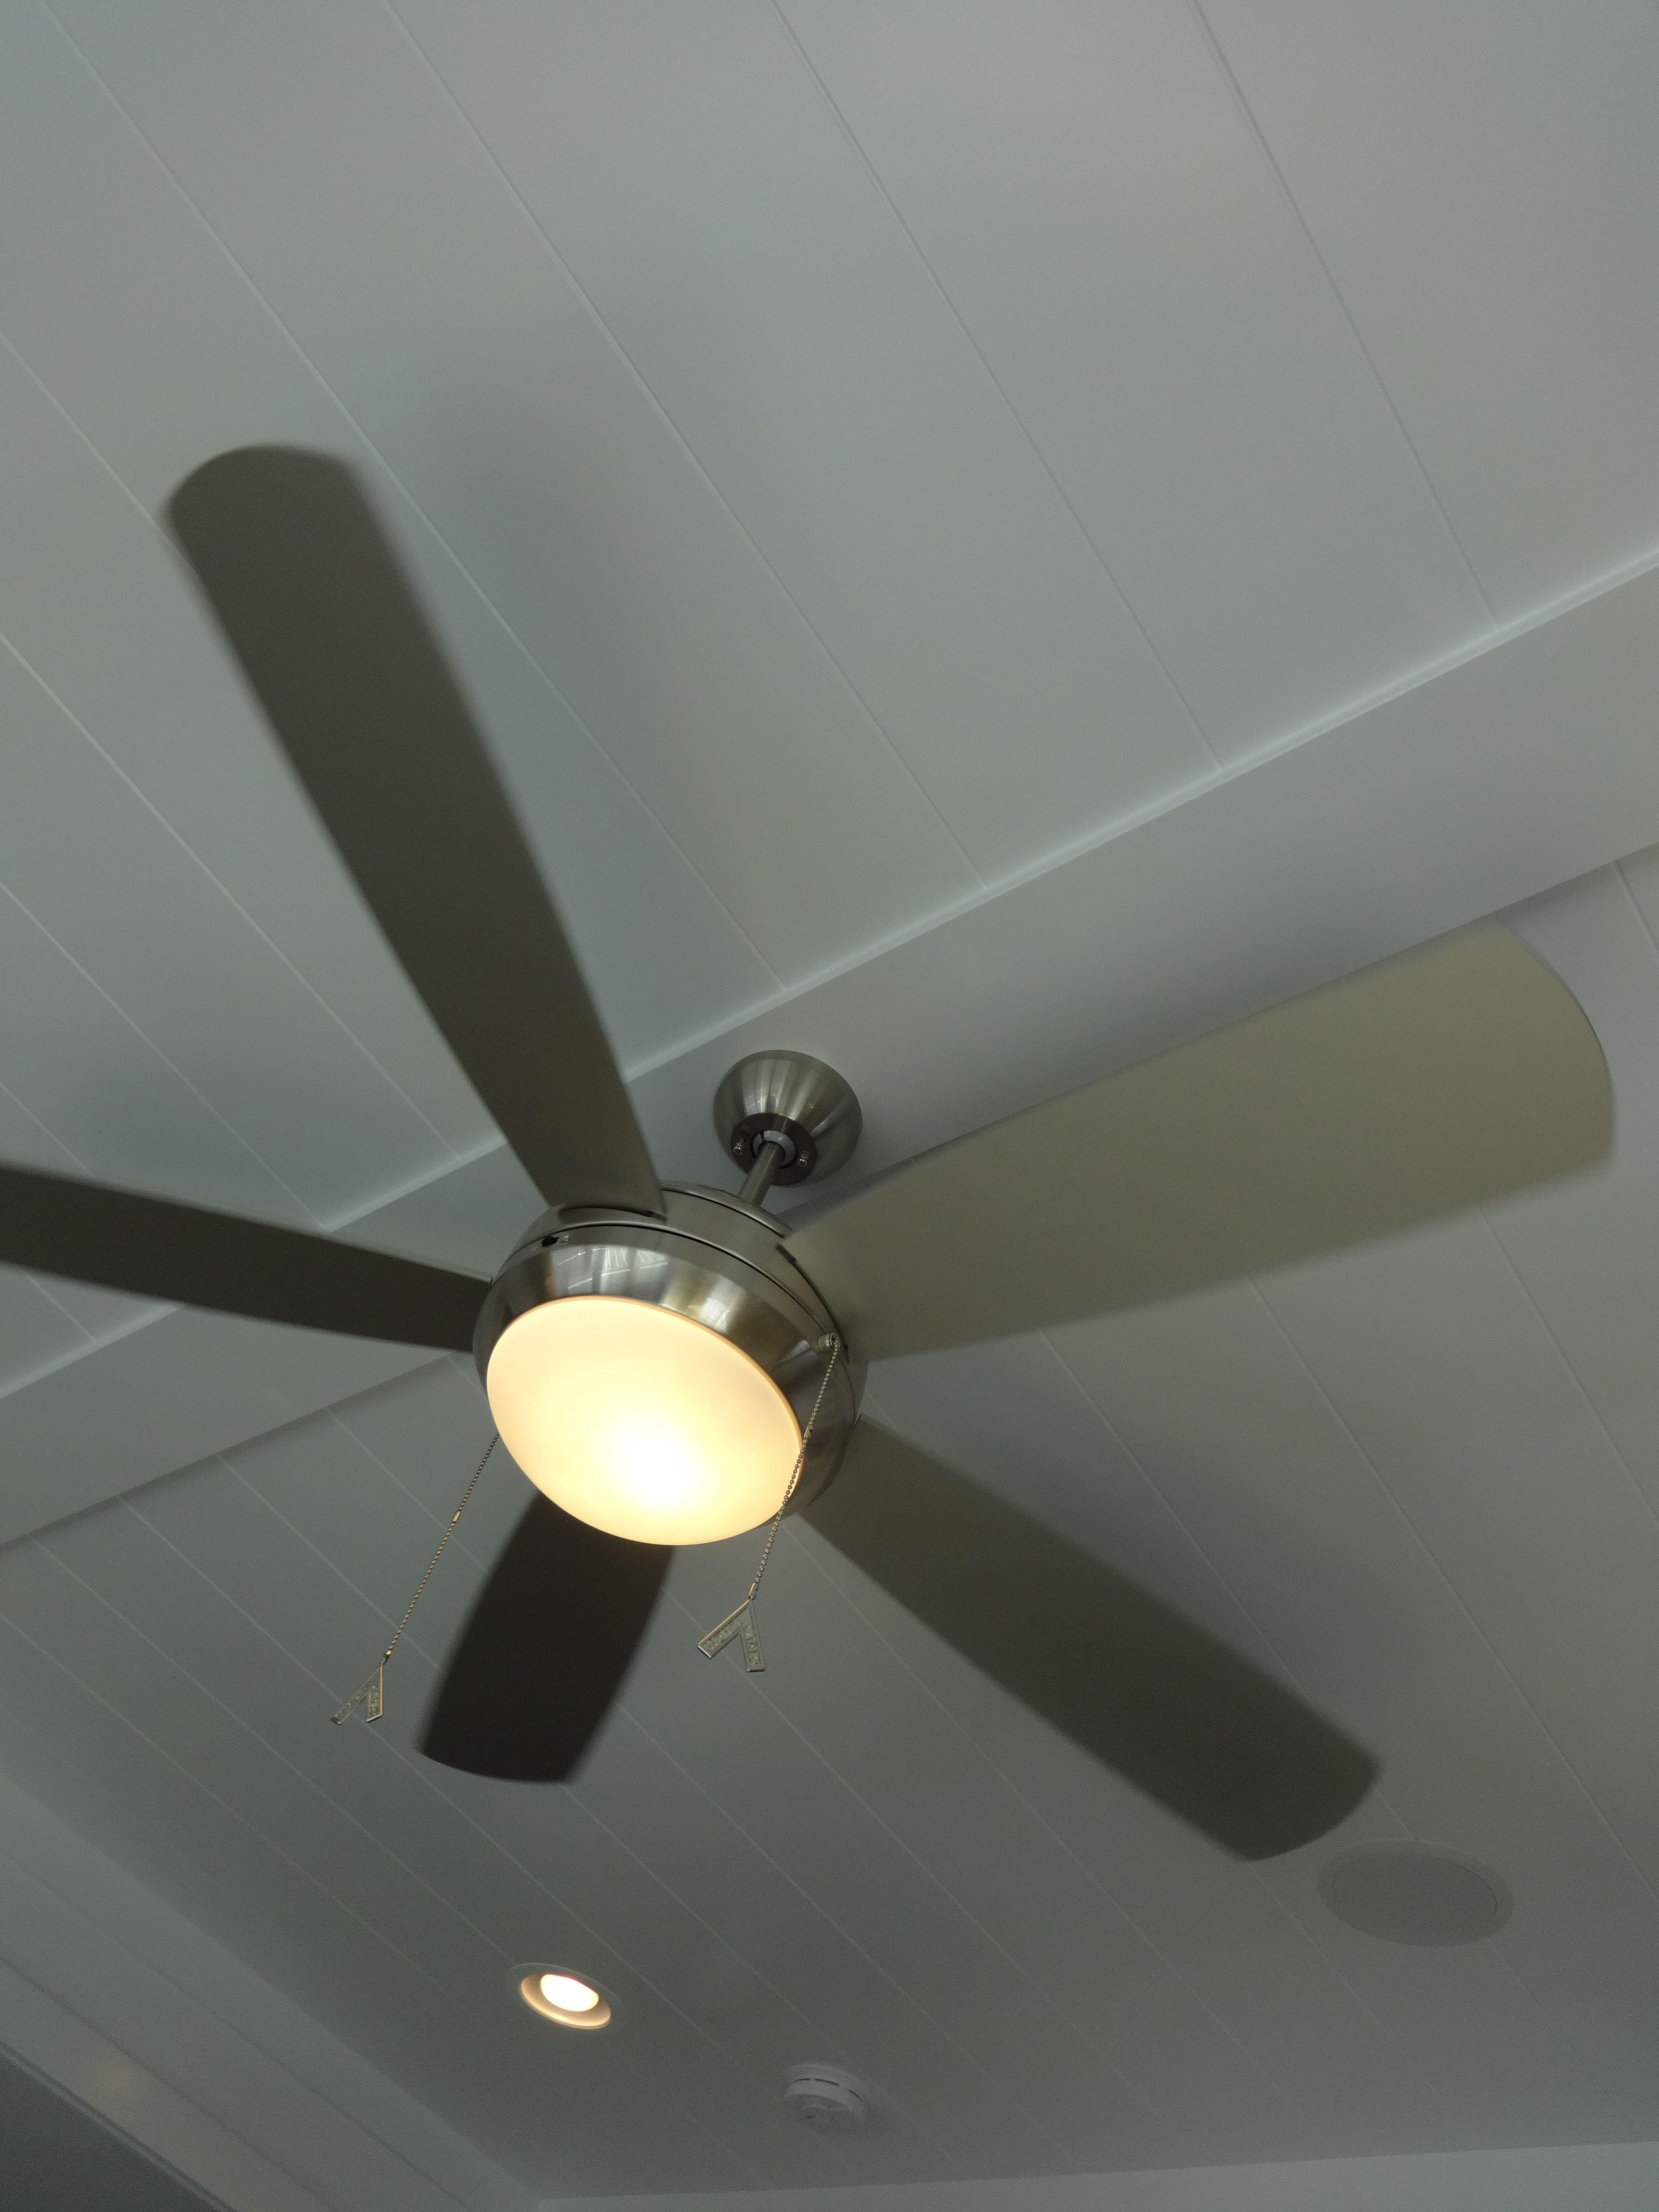 cool ceiling fan Dream Home